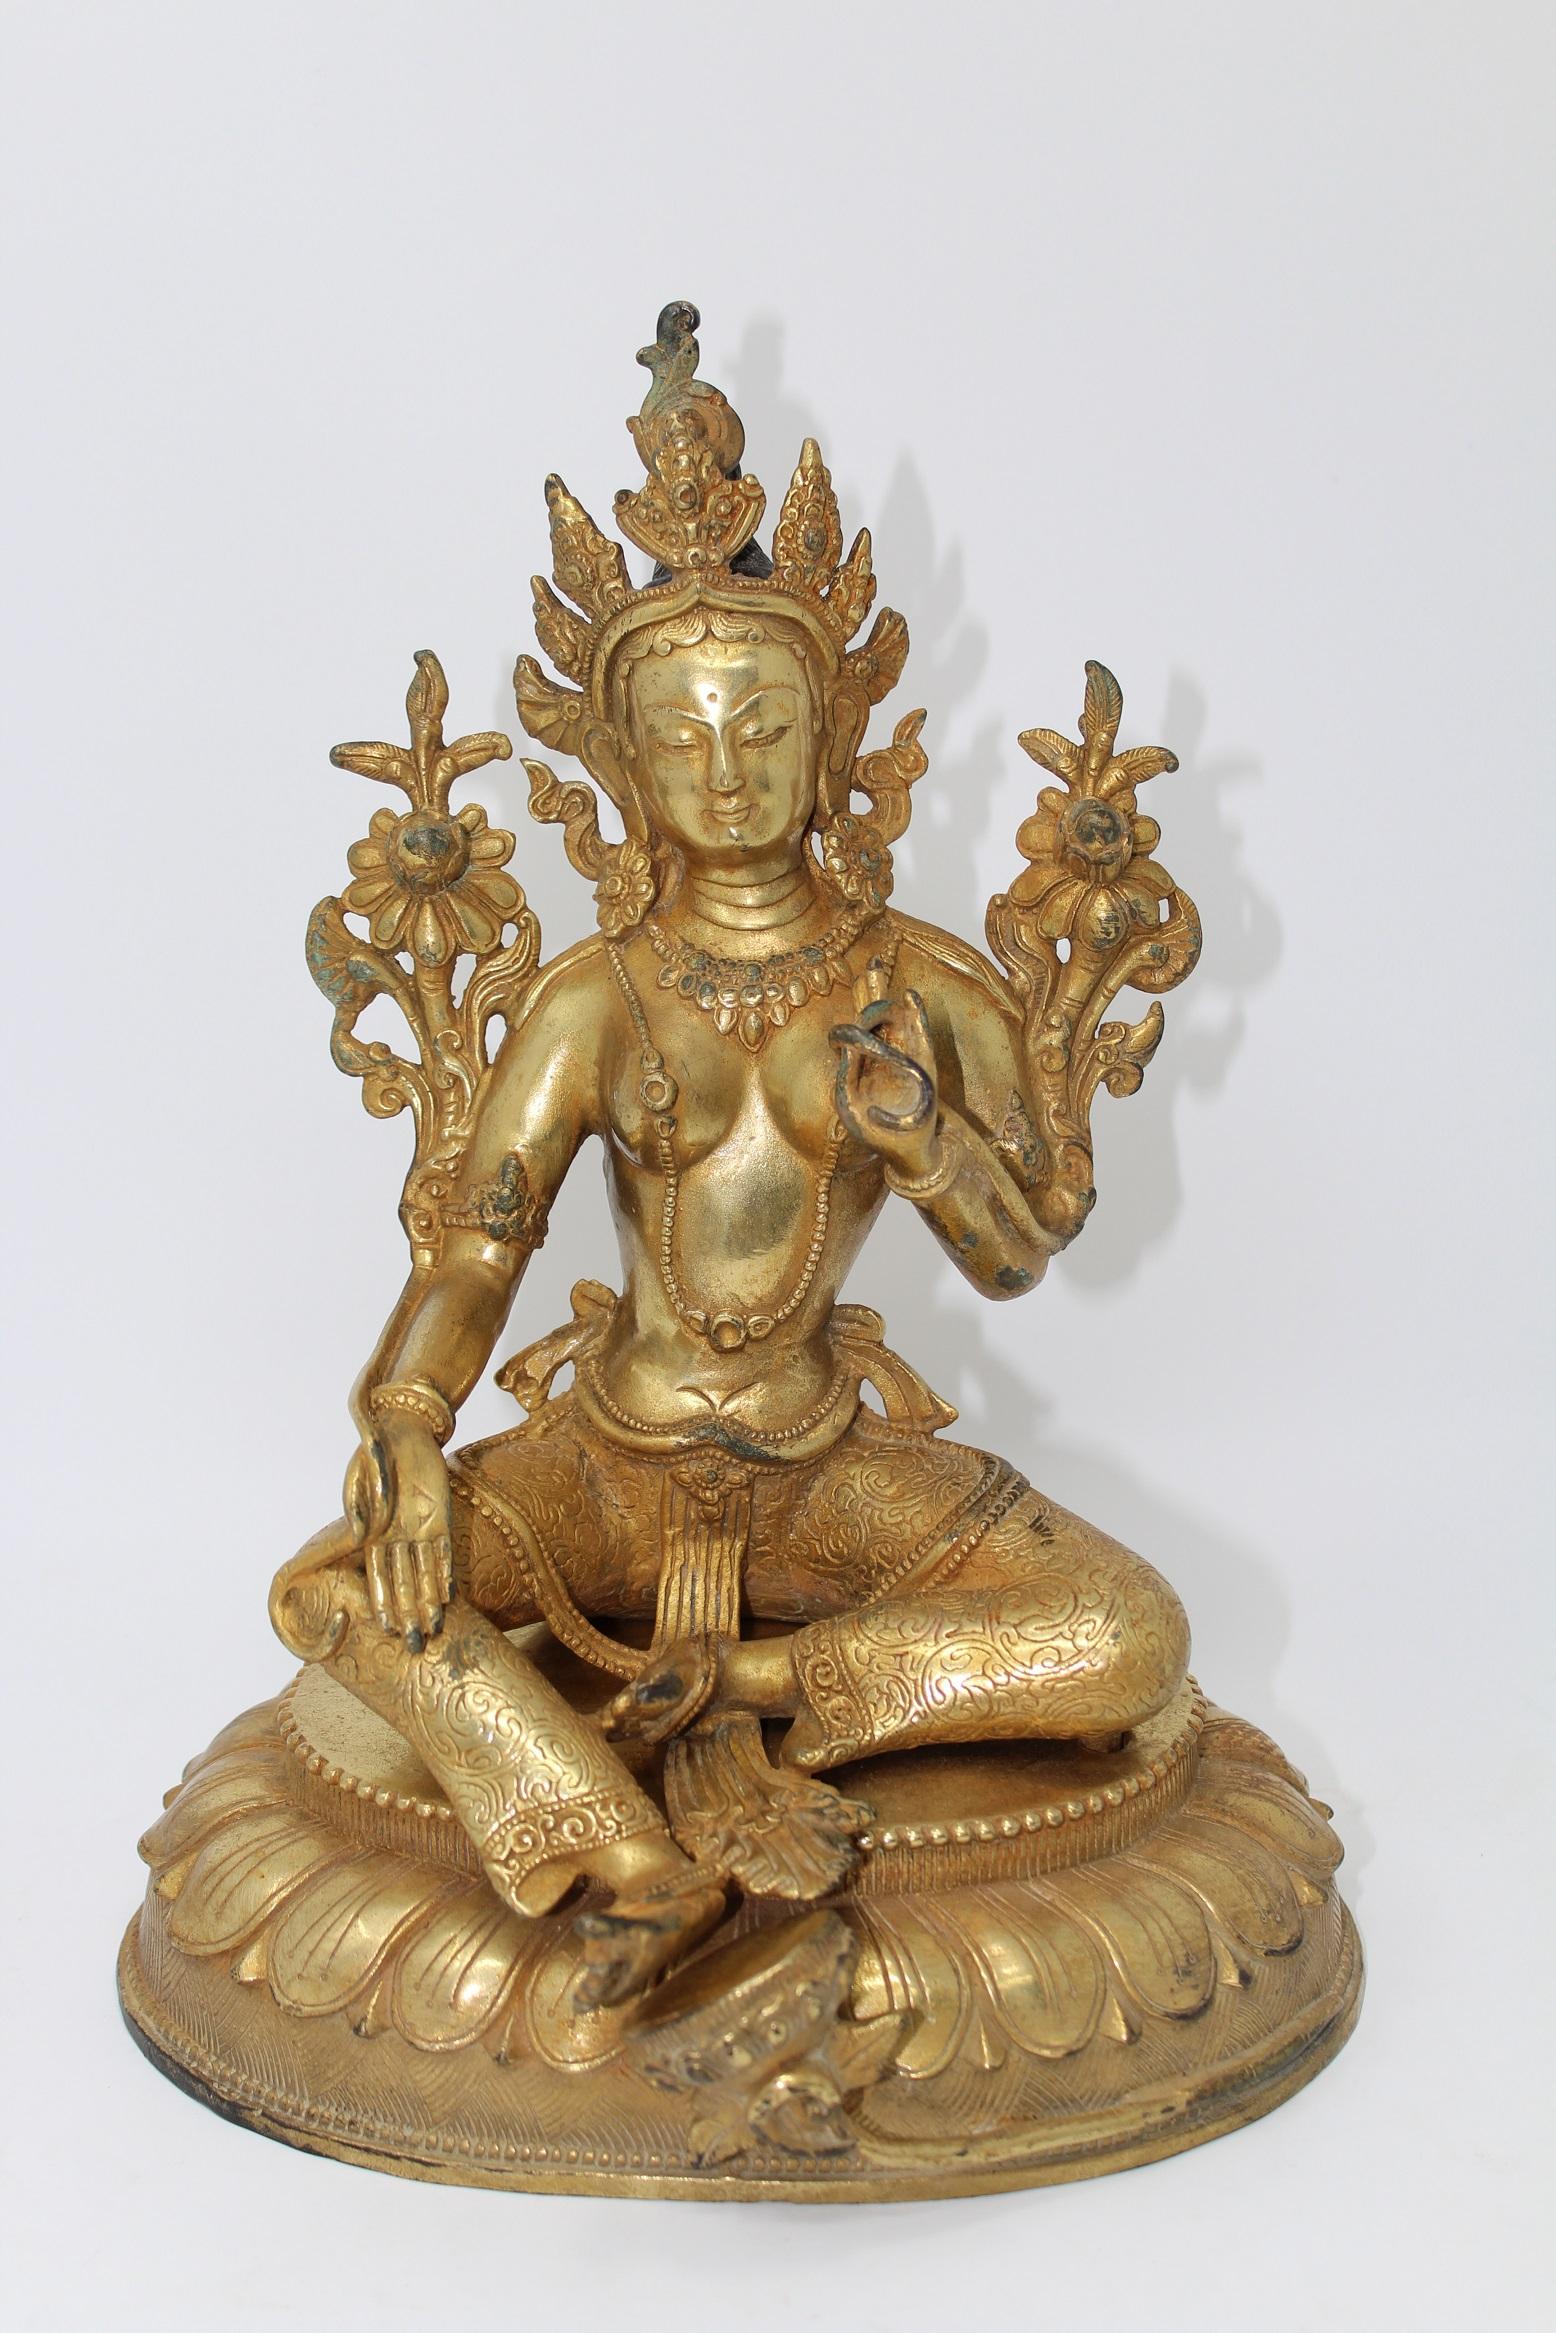 Lot 31 - Tibetan Seated Gilt Bronze Buddha Figure